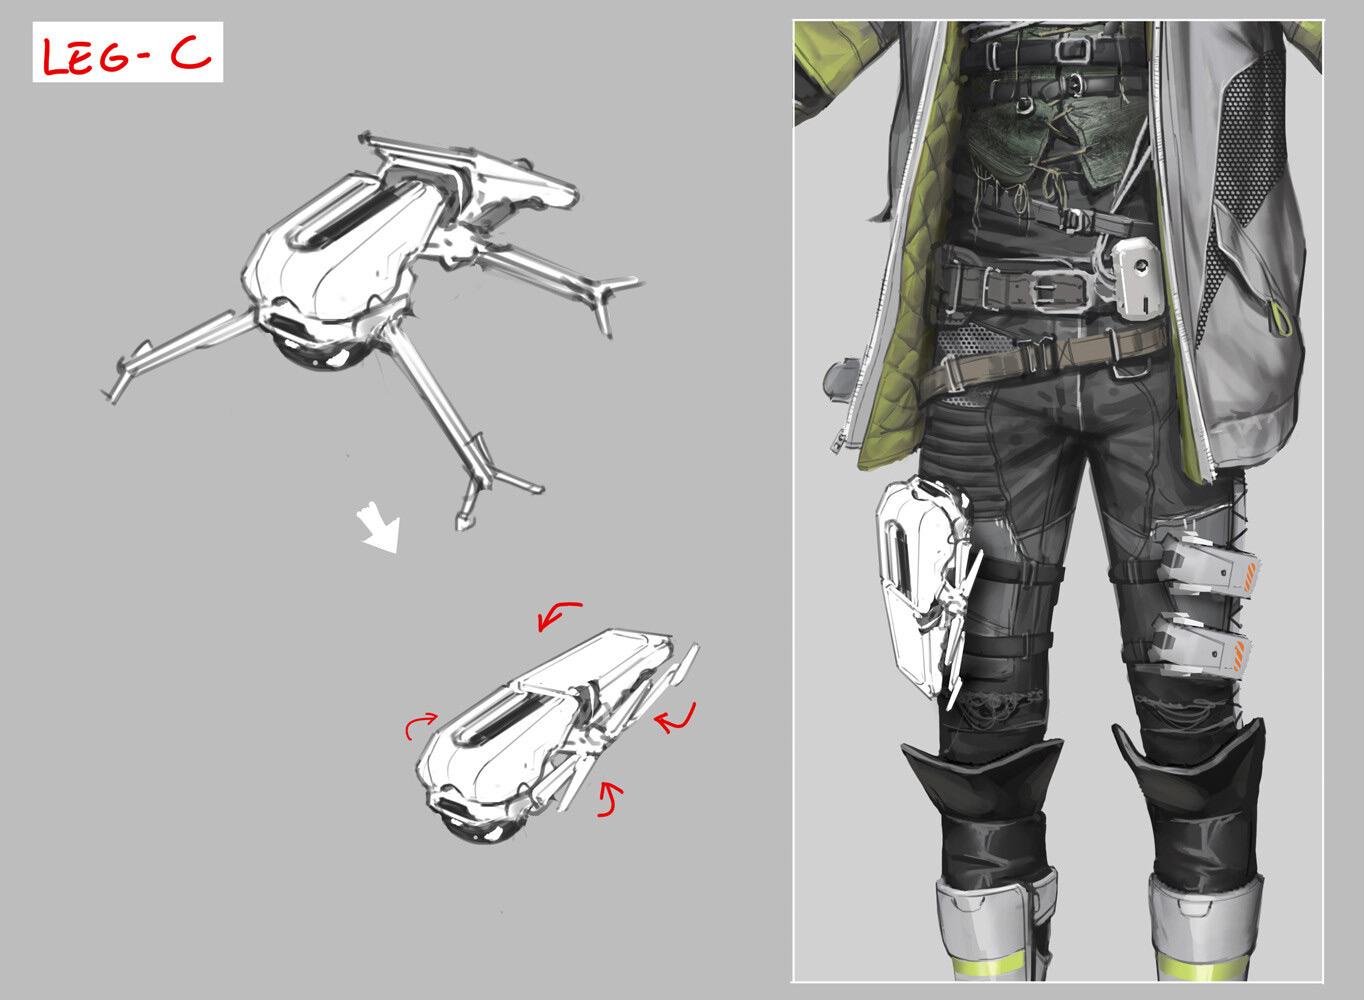 Quelle: Artstation - Hethe Srodawa - »Apex Legends« Character (Crypto)